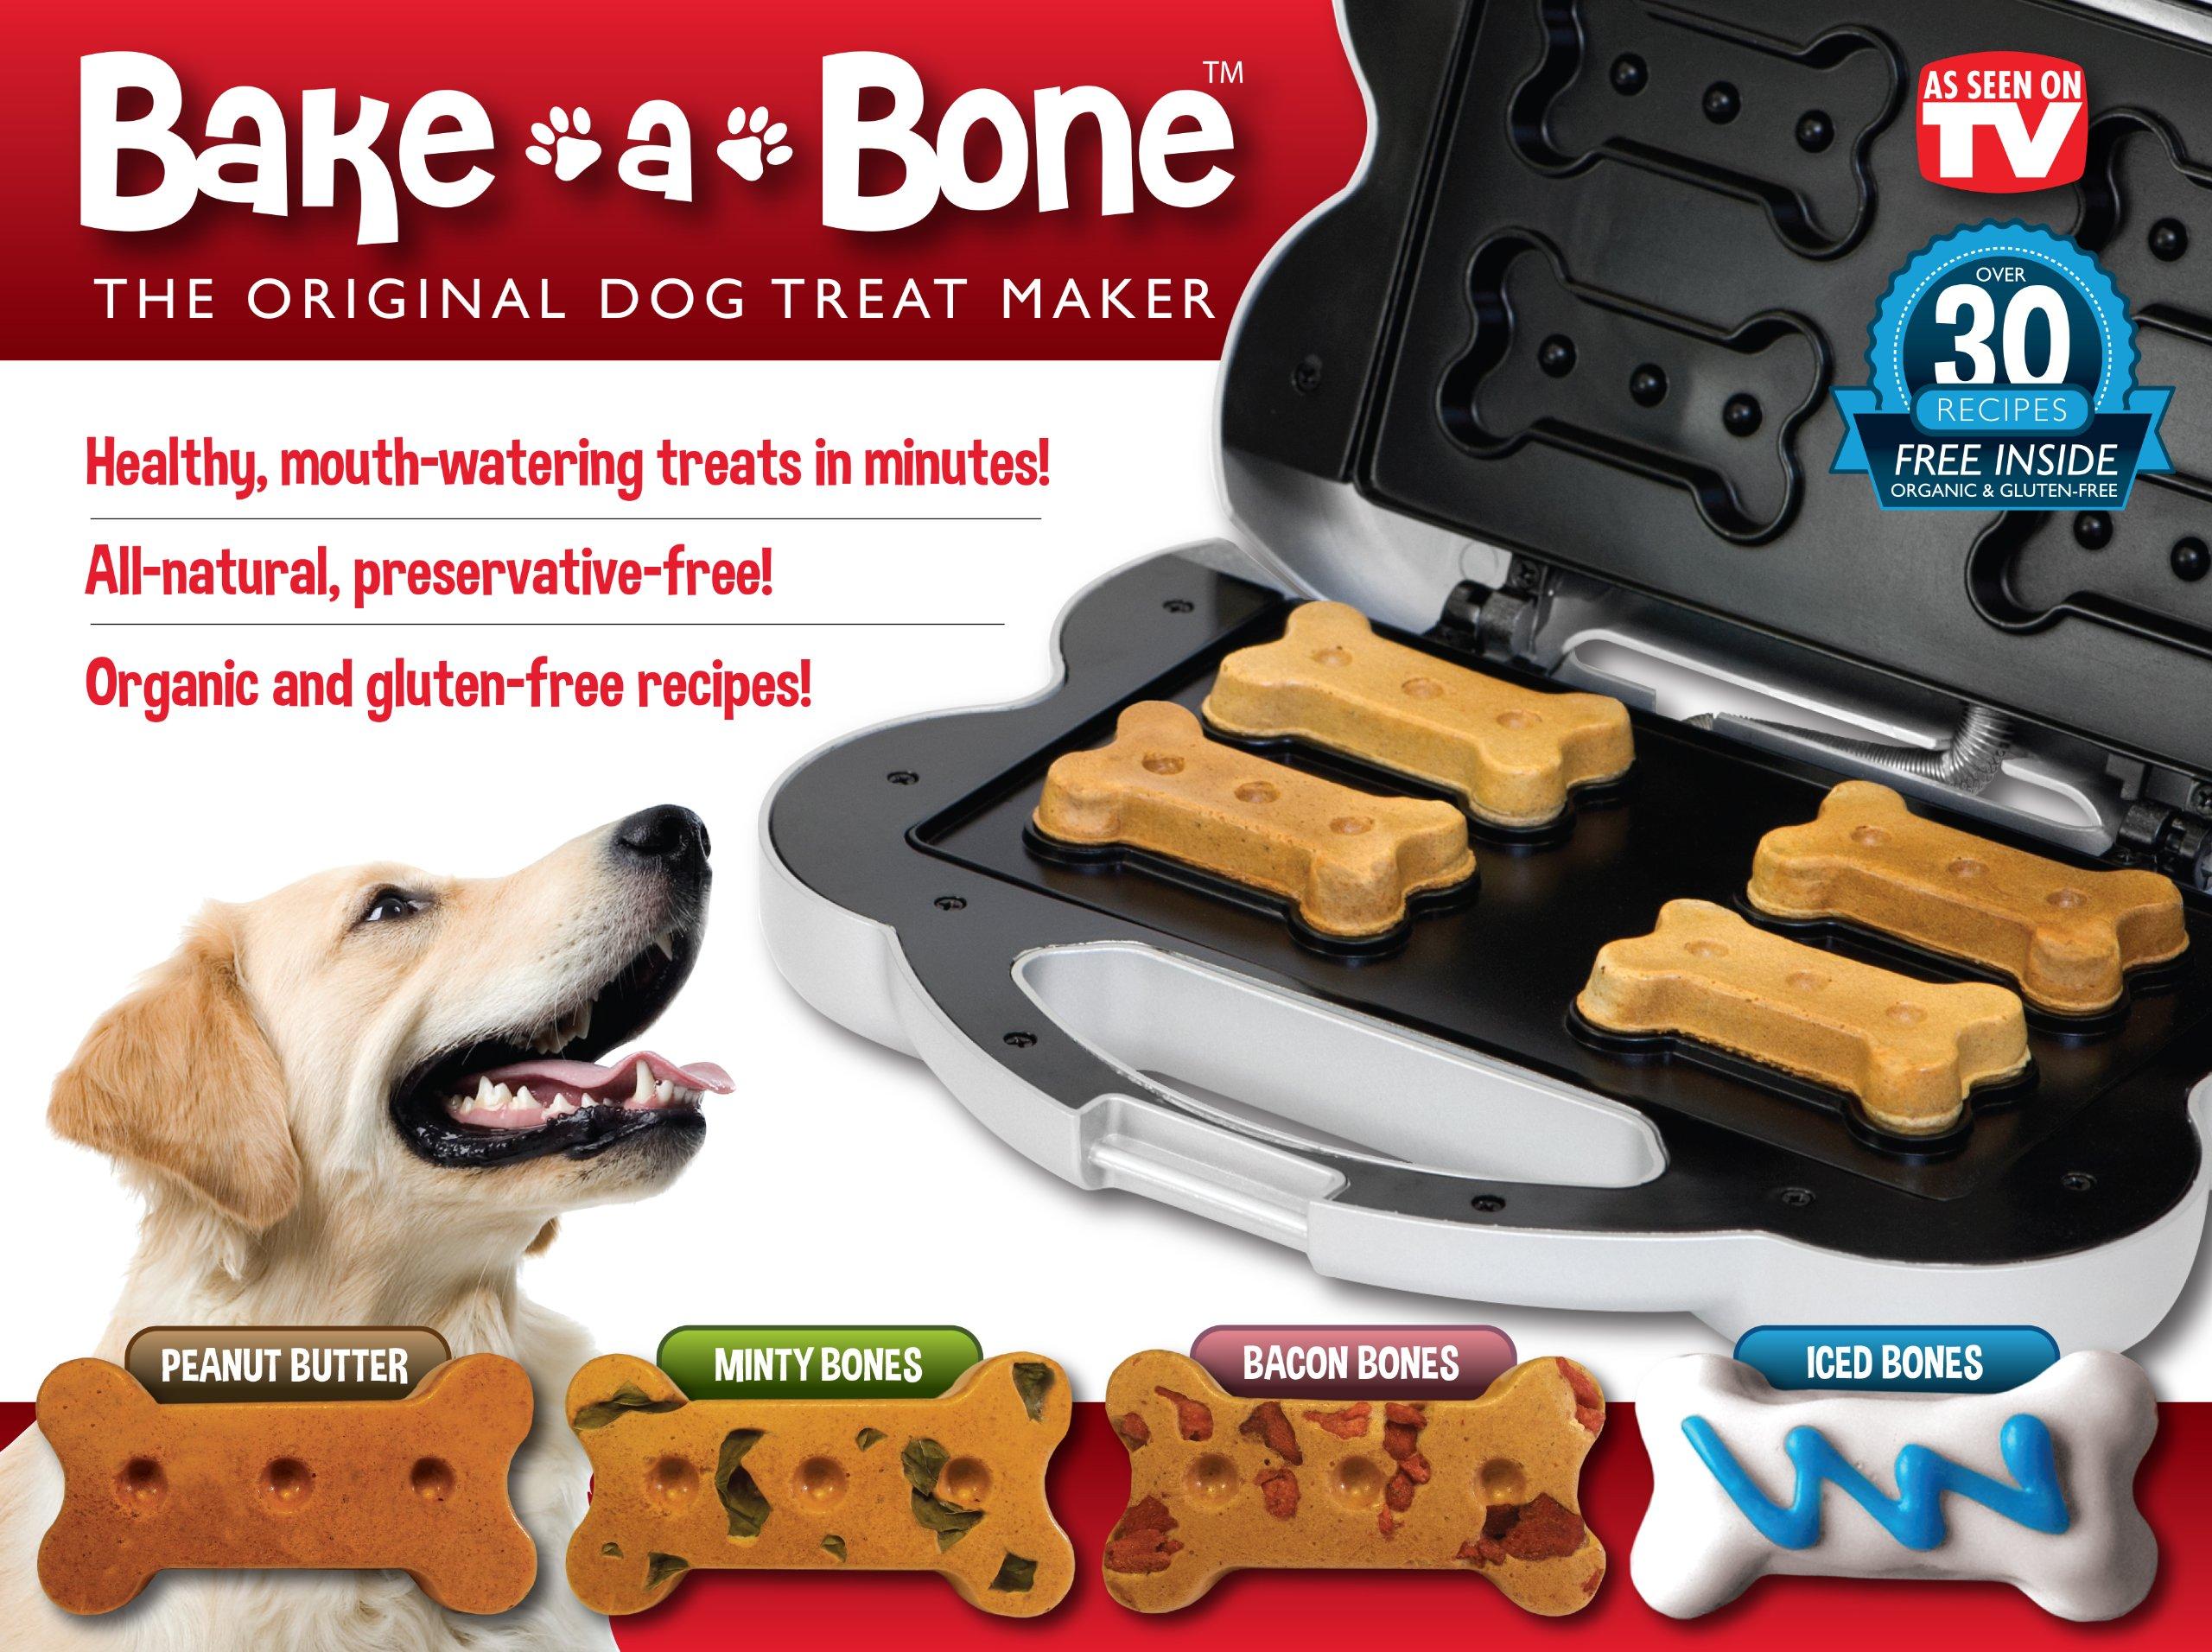 Bake-A-Bone The Original Dog Treat Maker by Bake-A-Bone